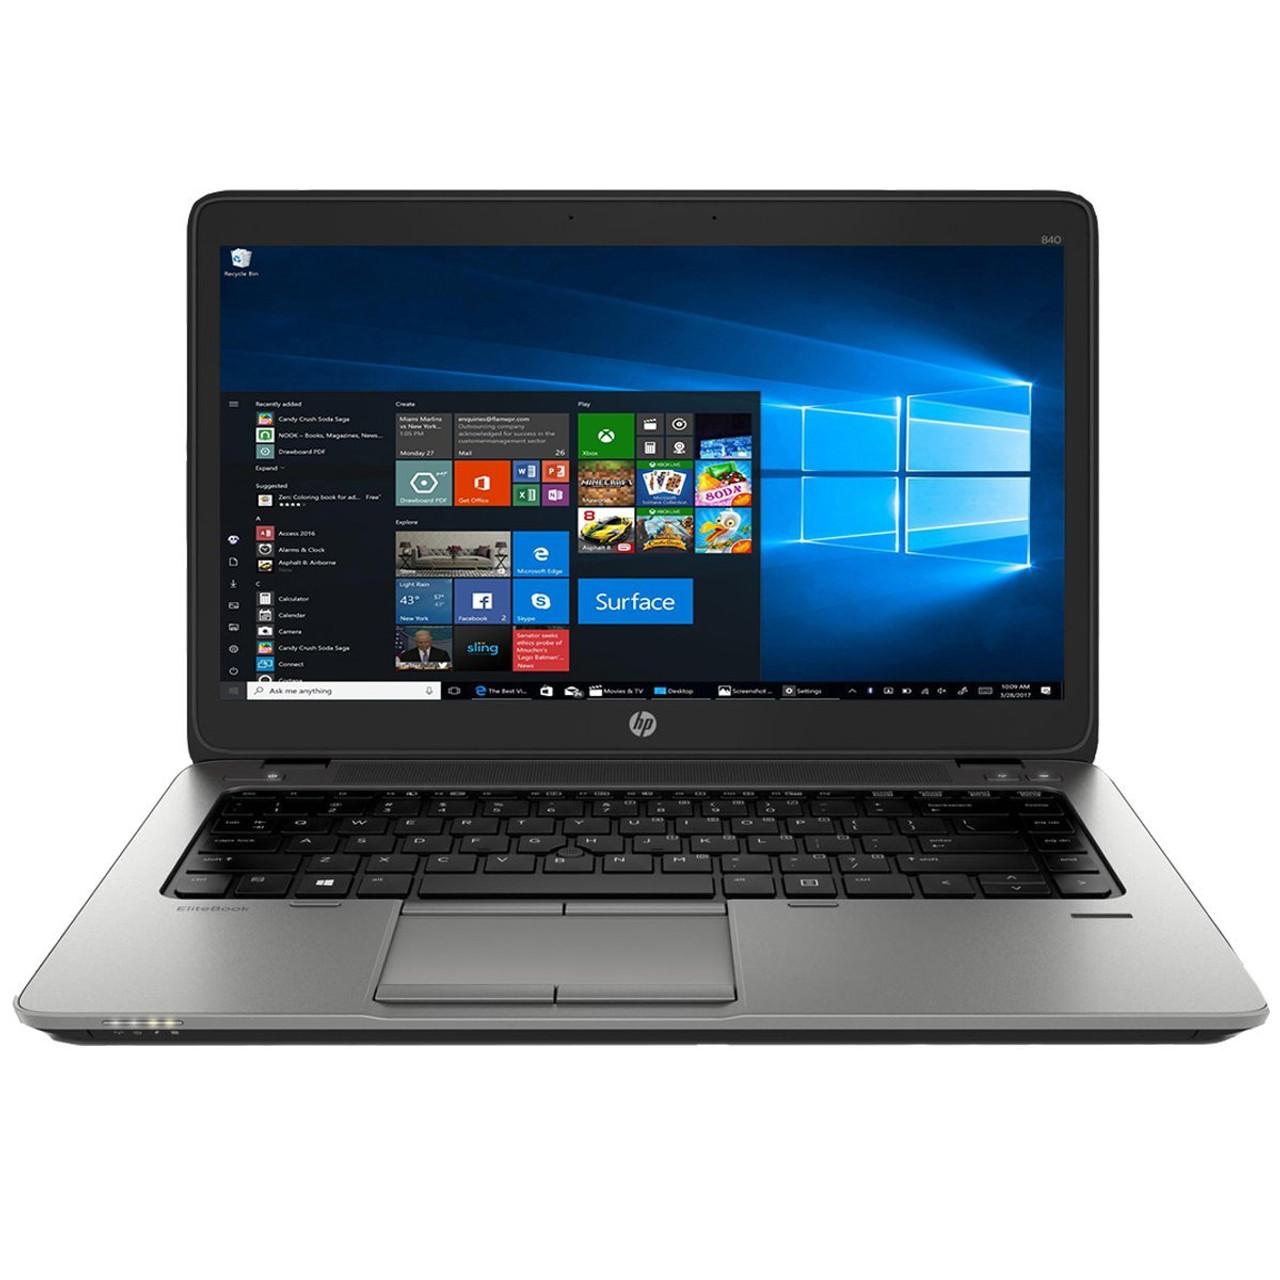 HP Elitebook 840 G1 Laptop Core i5 1.9GHz, 8GB Ram, 320GB HDD, DVD-RW, Windows 10 Pro 64 Notebook